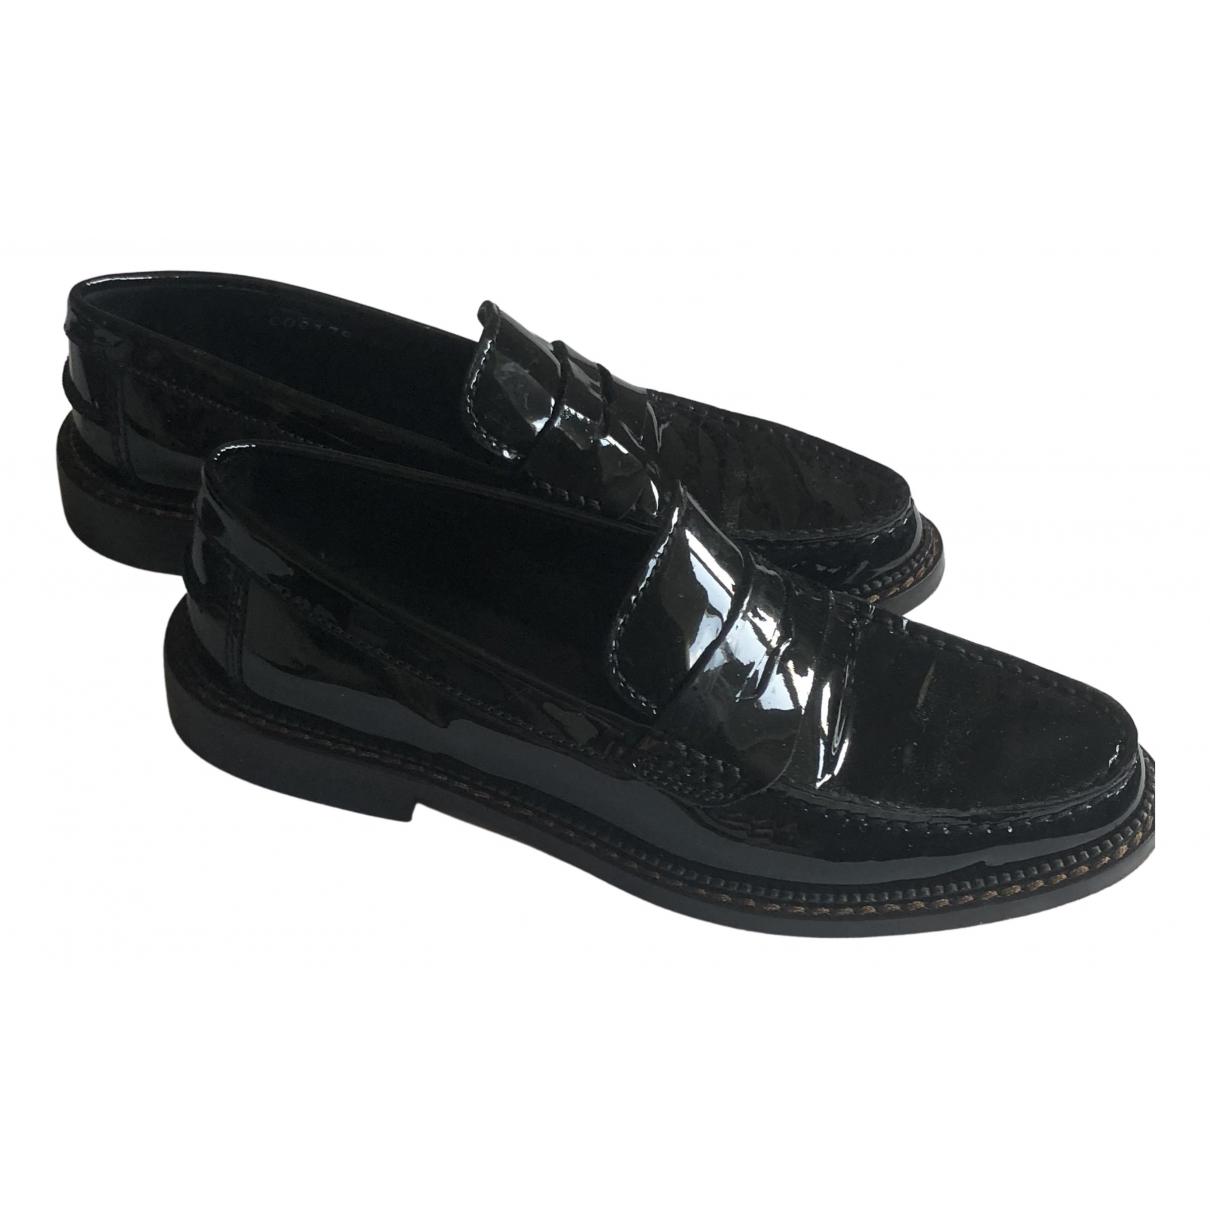 Dolce & Gabbana N Black Leather Mules & Clogs for Women 35 EU